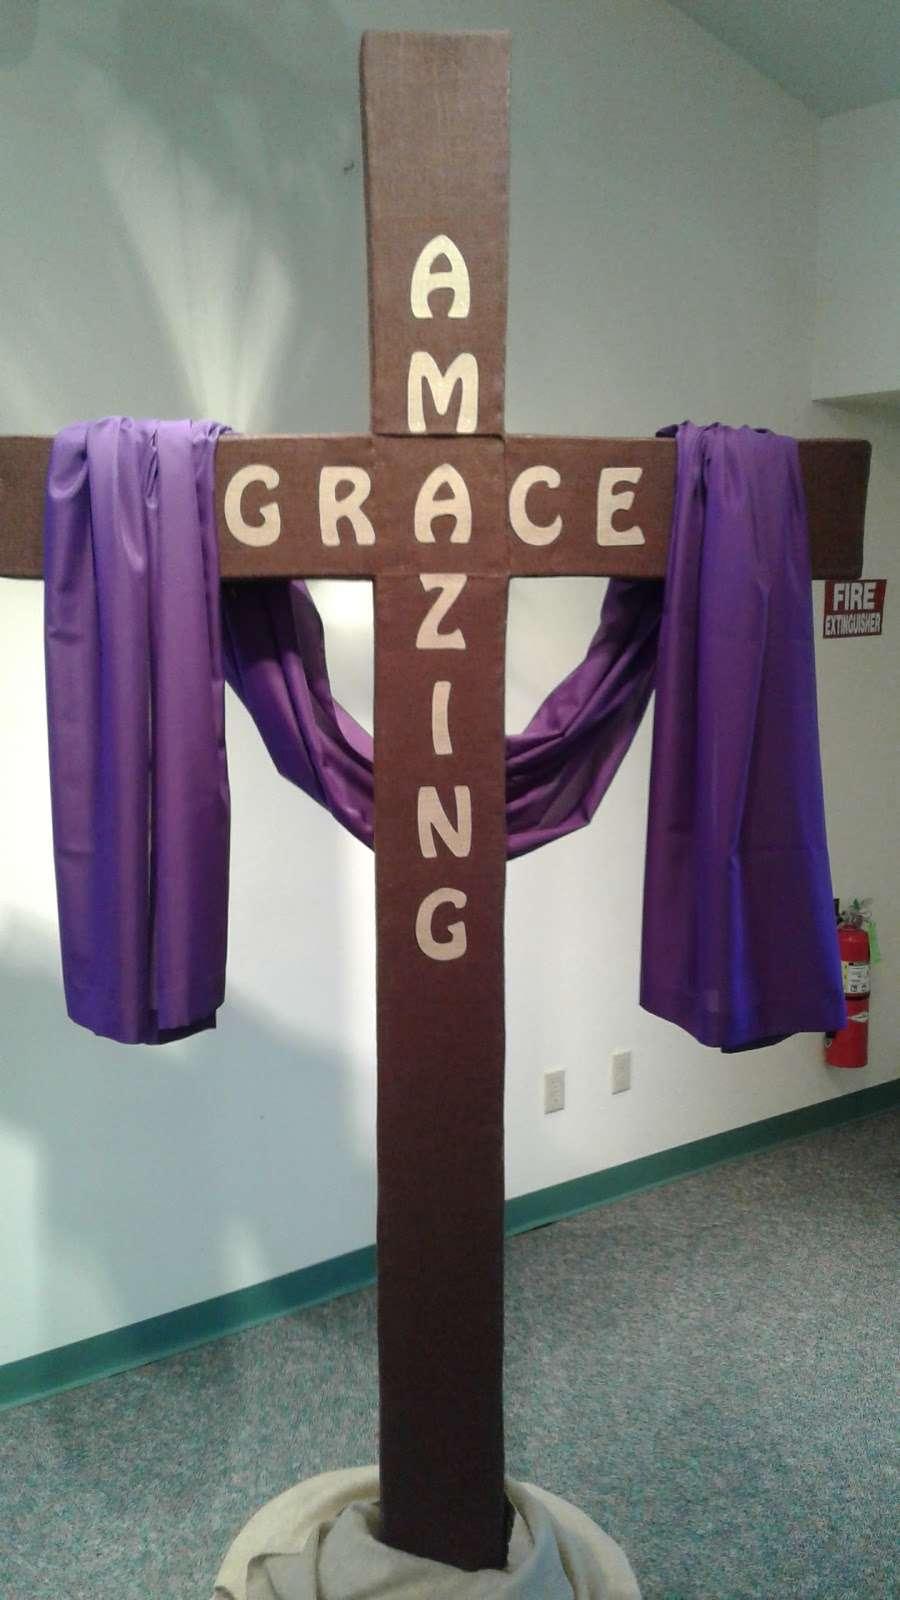 Resurrection Lutheran Church - church  | Photo 6 of 10 | Address: 12400 W Cold Spring Rd, New Berlin, WI 53151, USA | Phone: (262) 786-8880